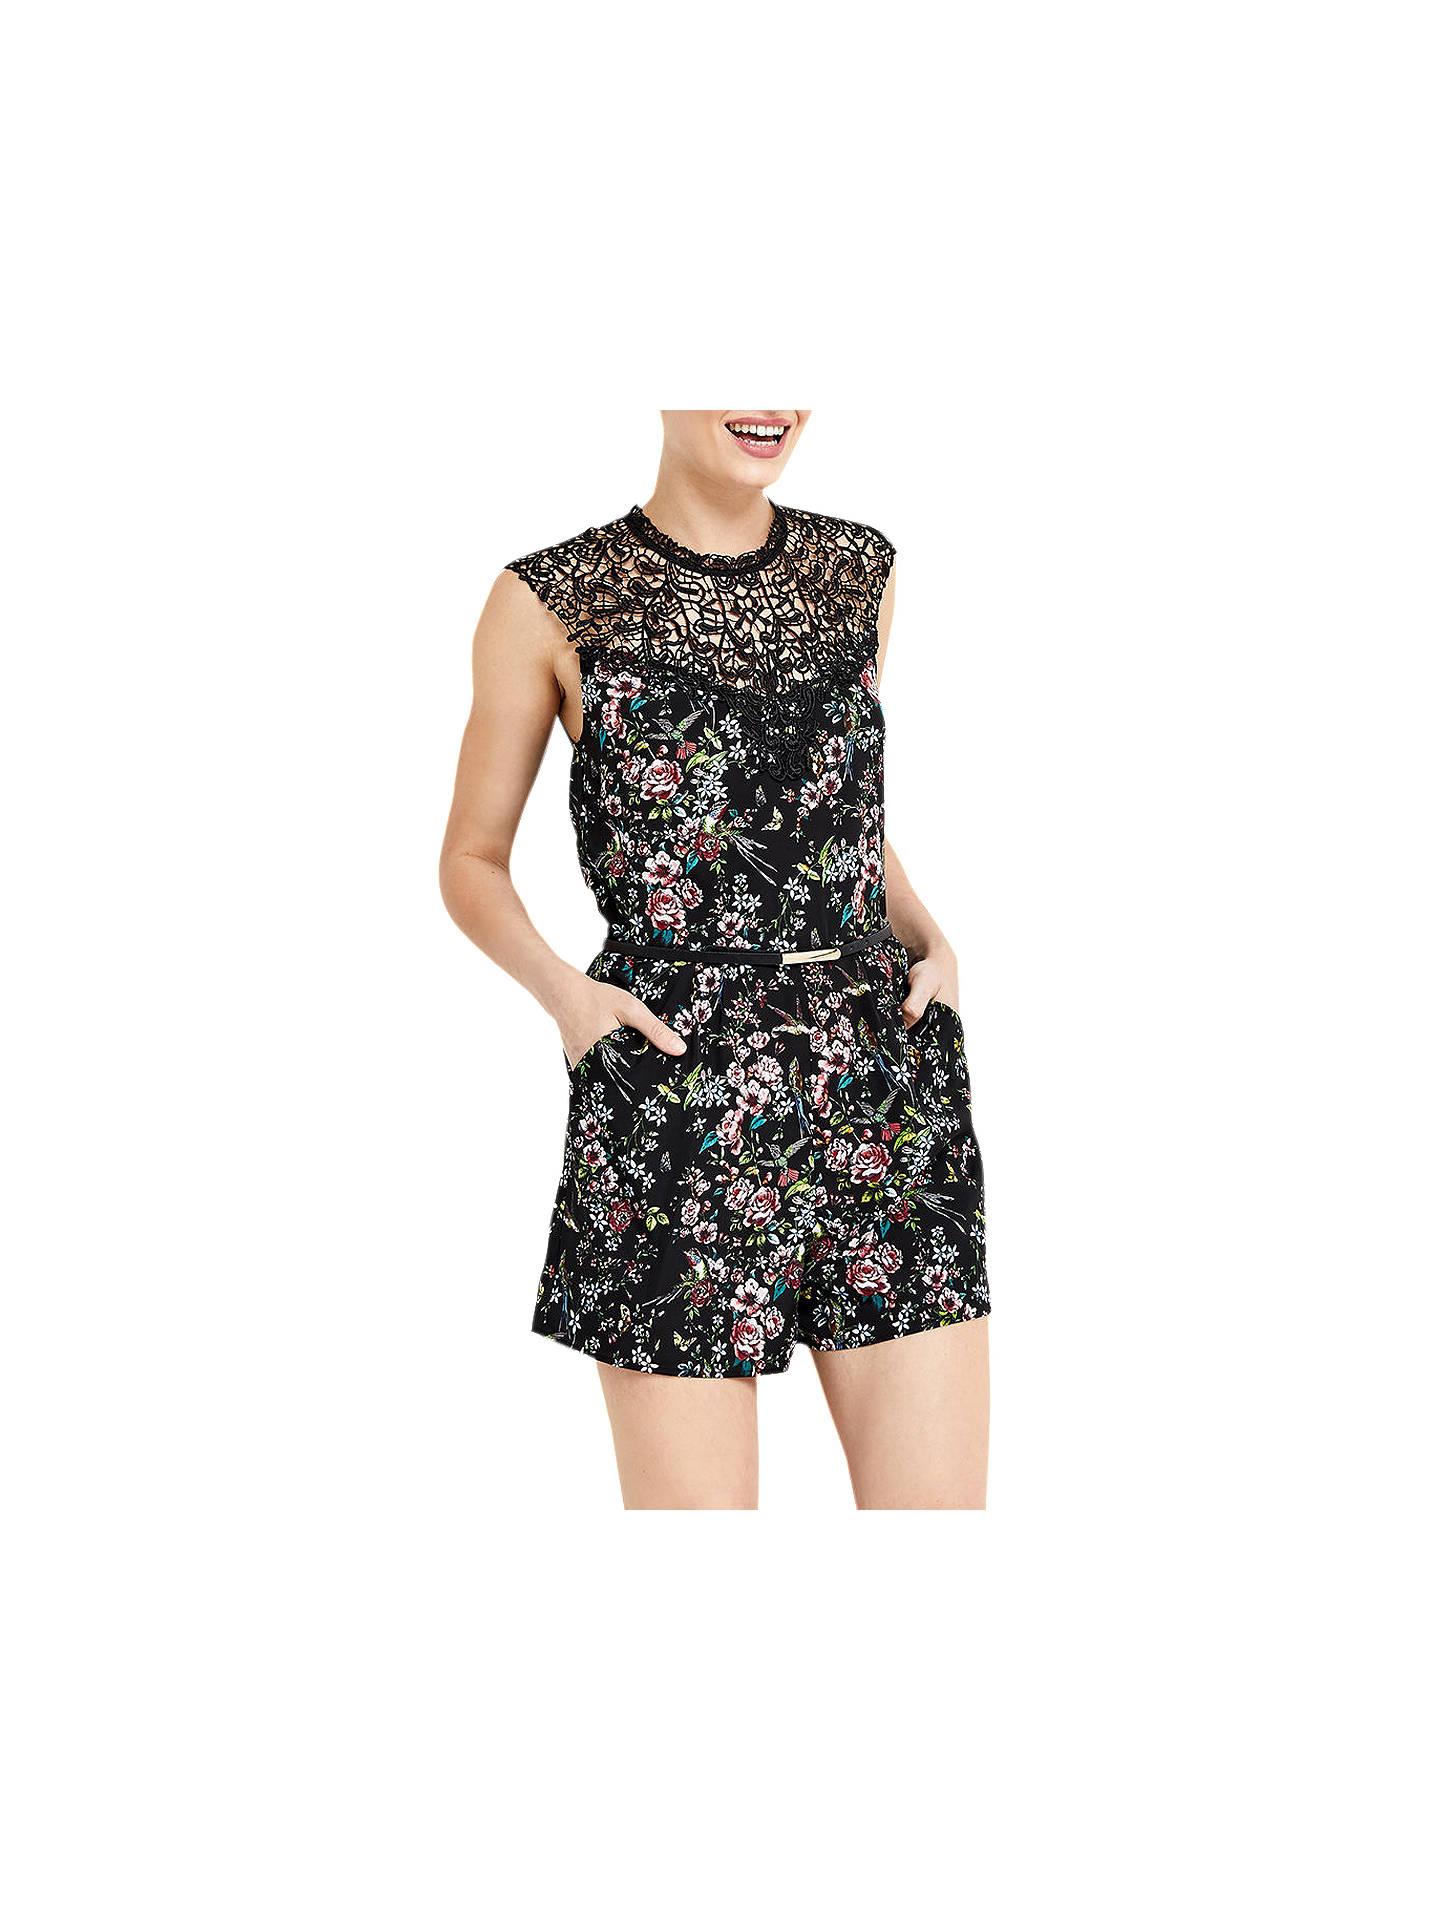 5974b0bbd329 Buy Oasis Royal Worcester Collection Floral Print Playsuit, Black/Multi, 6  Online at ...